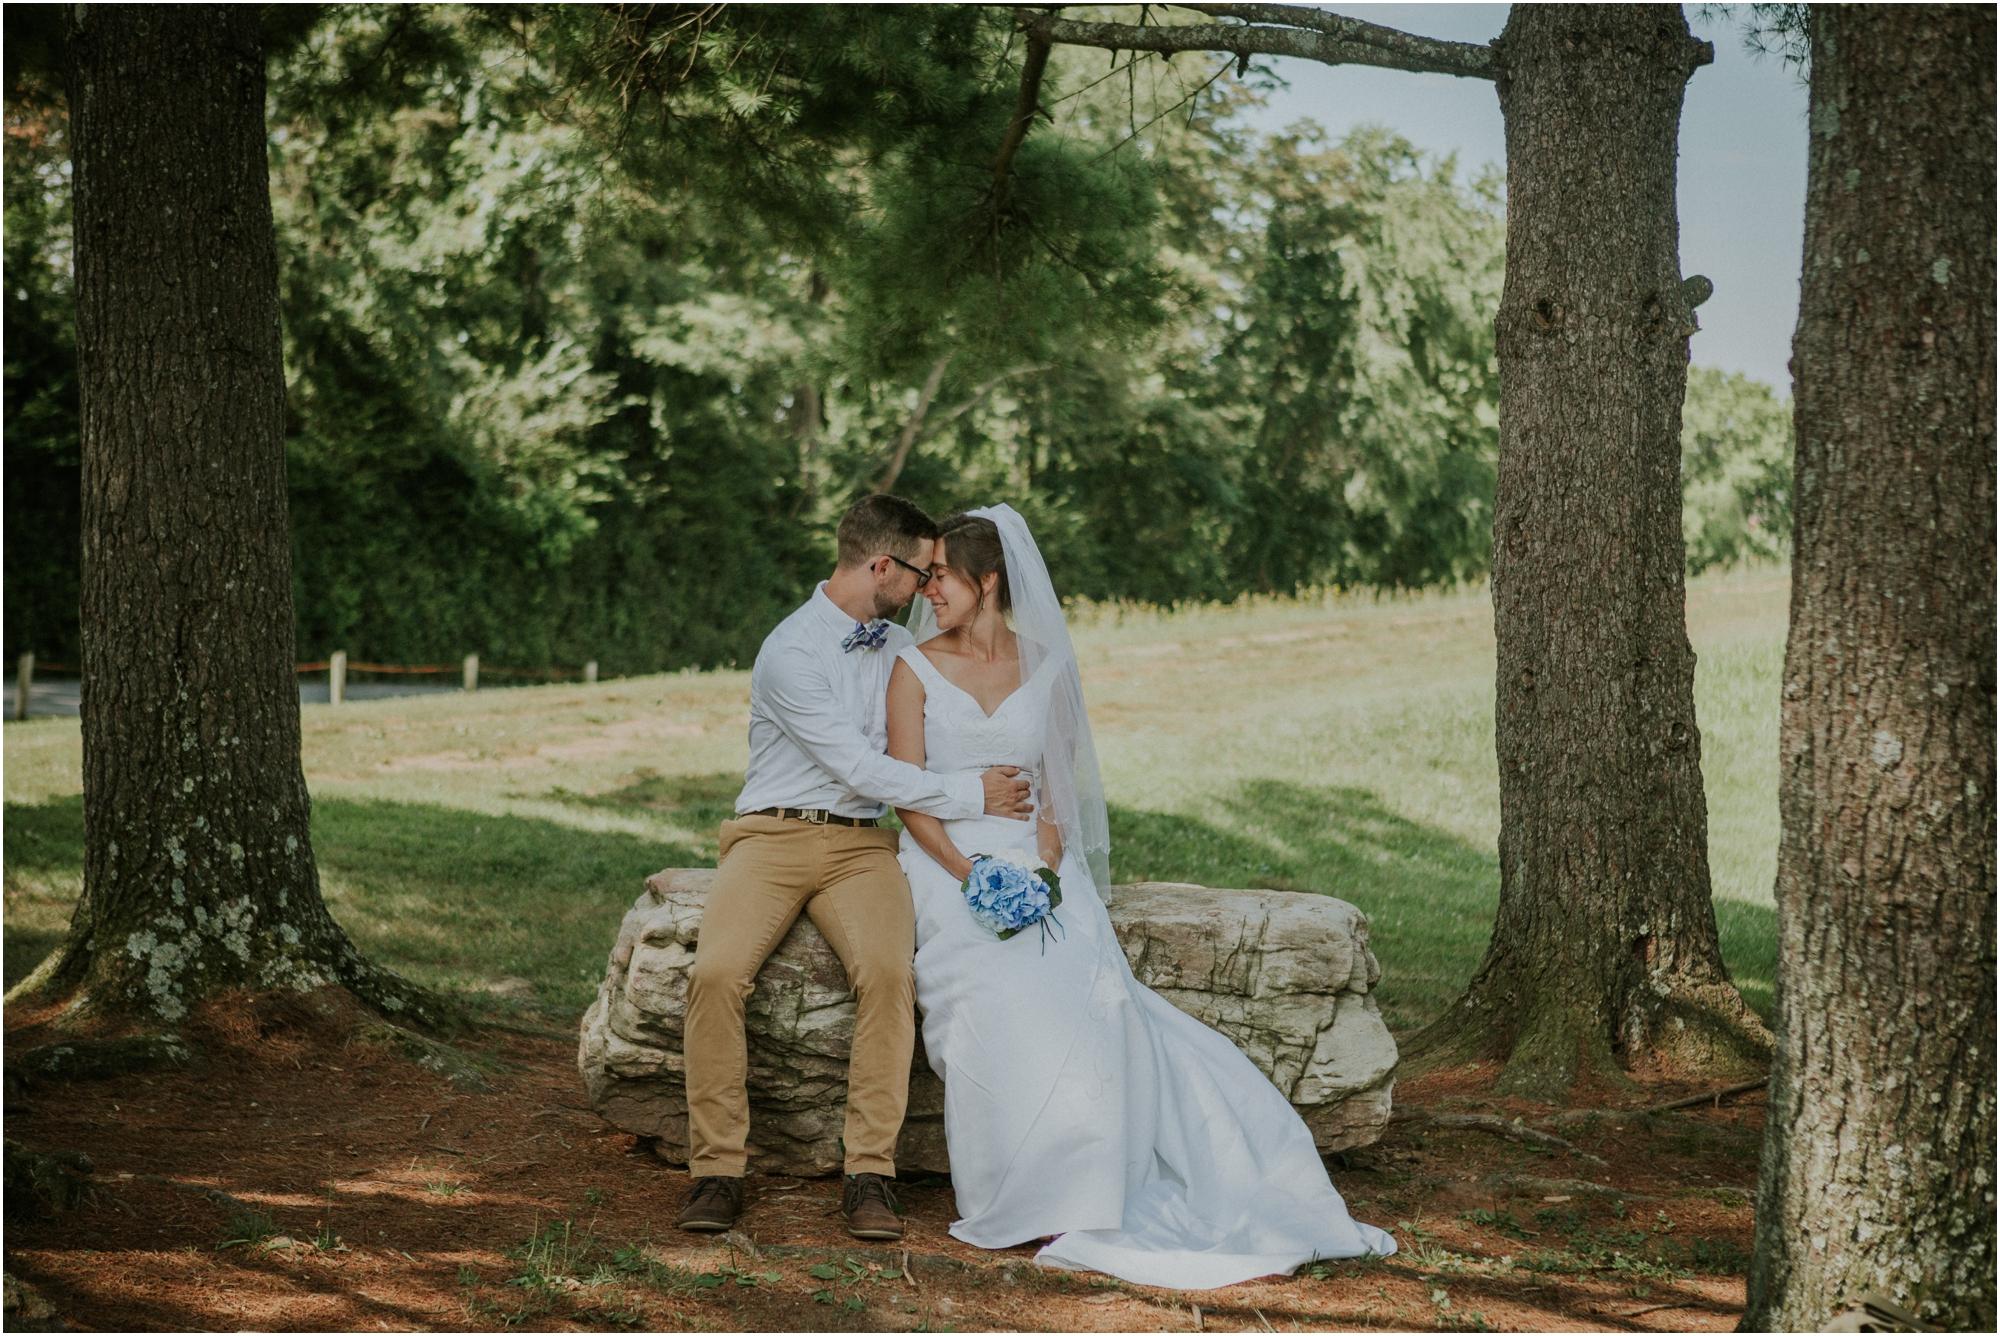 sugar-hollow-park-bristol-virginia-wedding-intimate-woodsy-black-forest-ceremony-adventurous-couple_0058.jpg